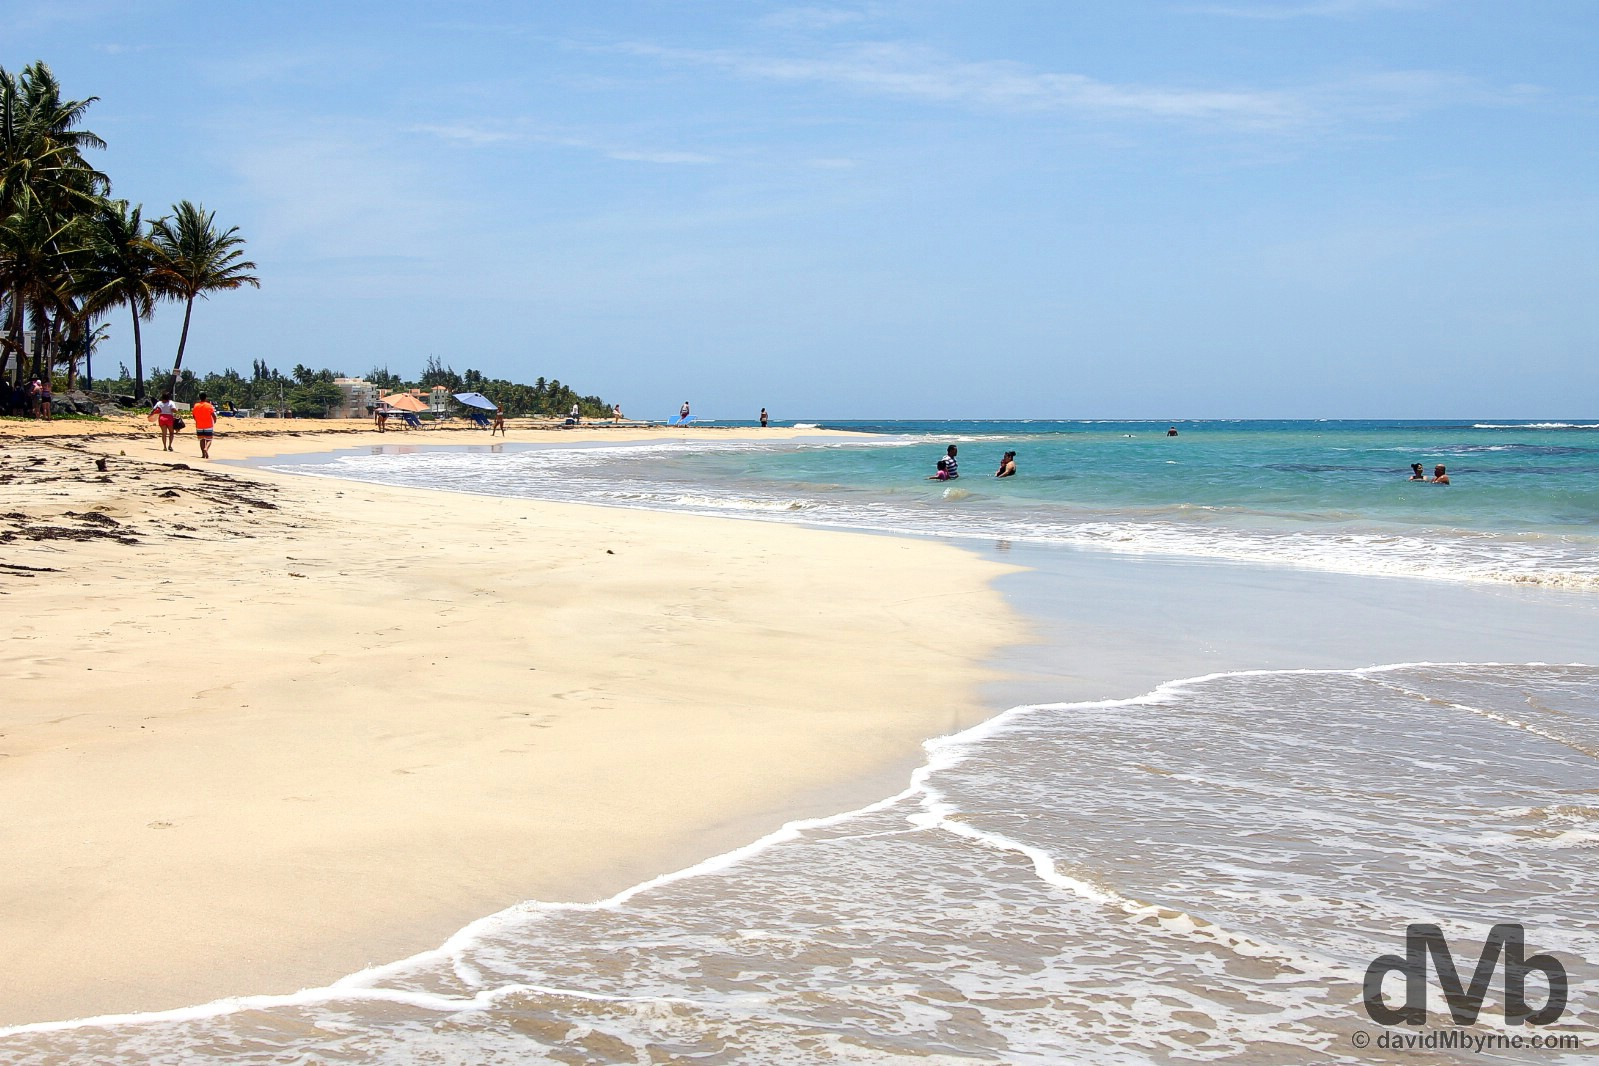 Playa Luquillo, eastern Puerto Rico, Greater Antilles. June 5, 2015.